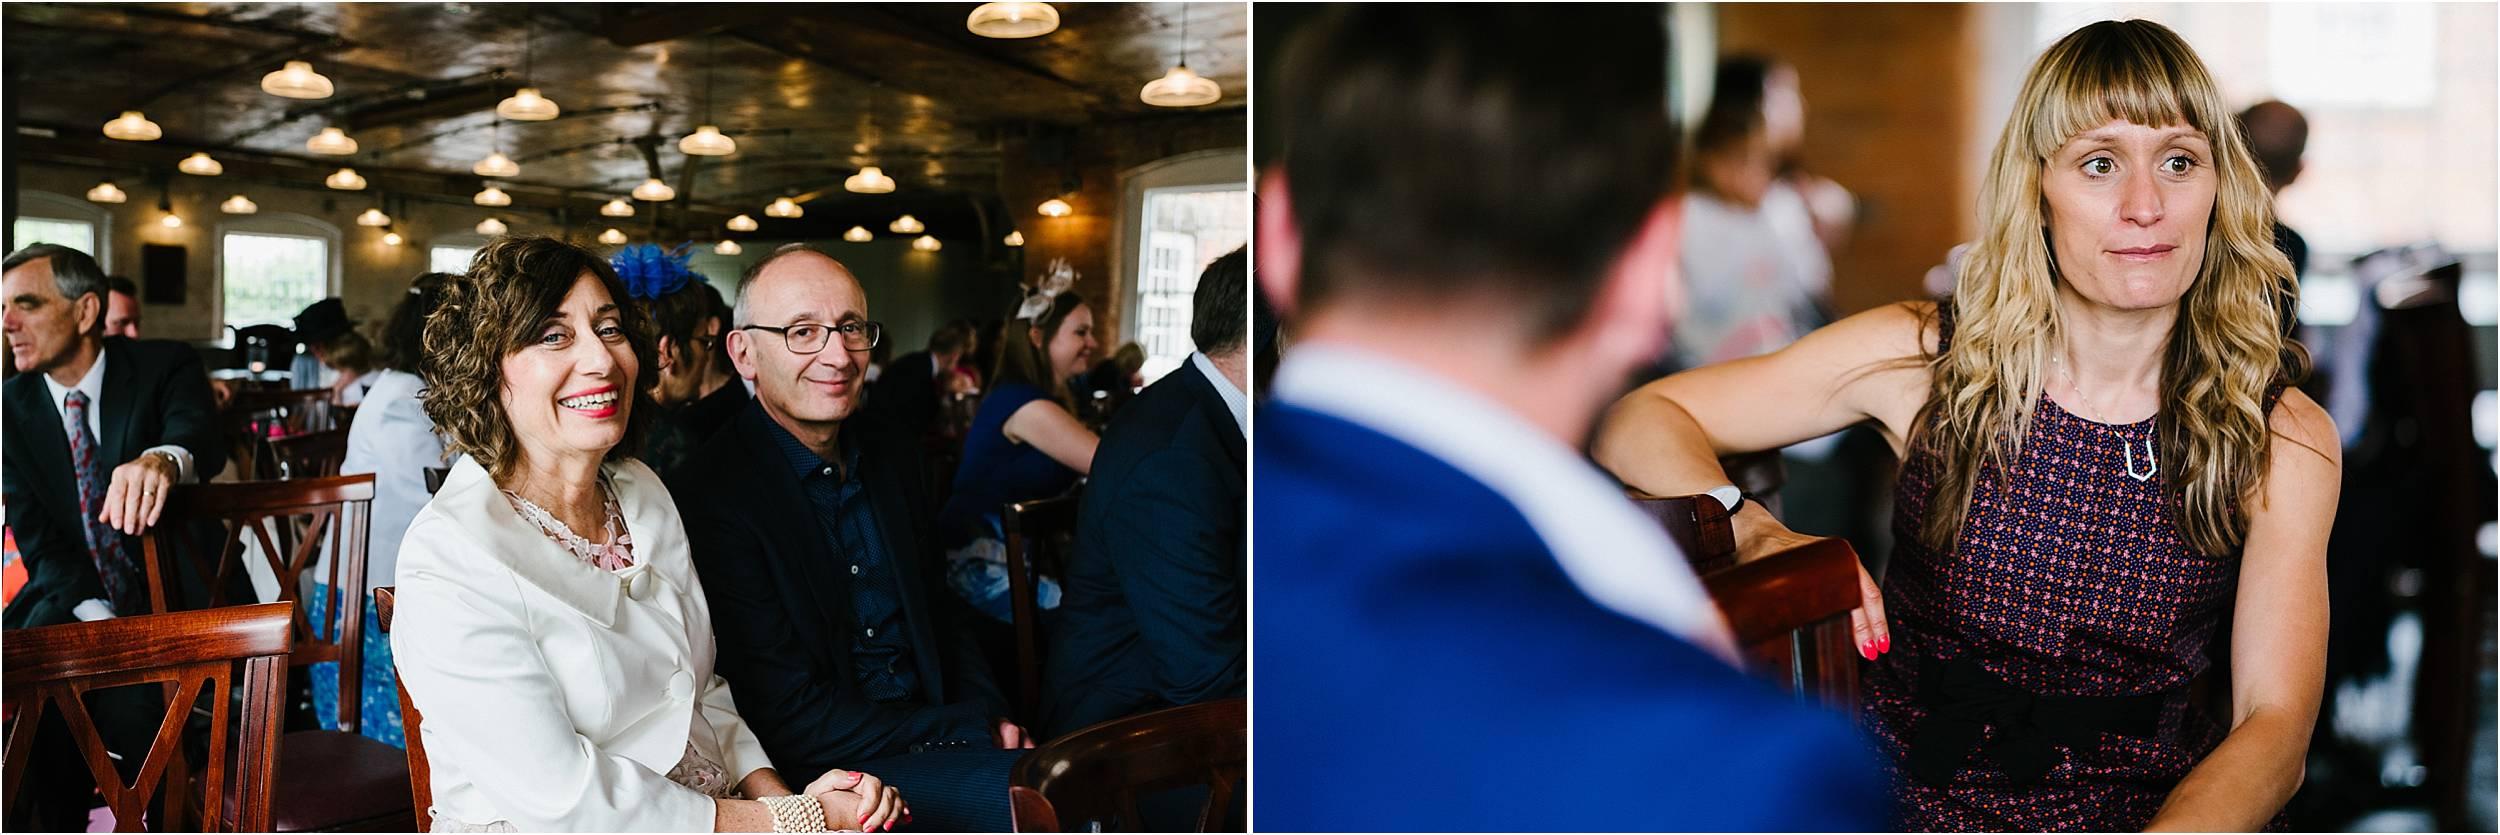 West Mill Derby Wedding Photographer_0085.jpg